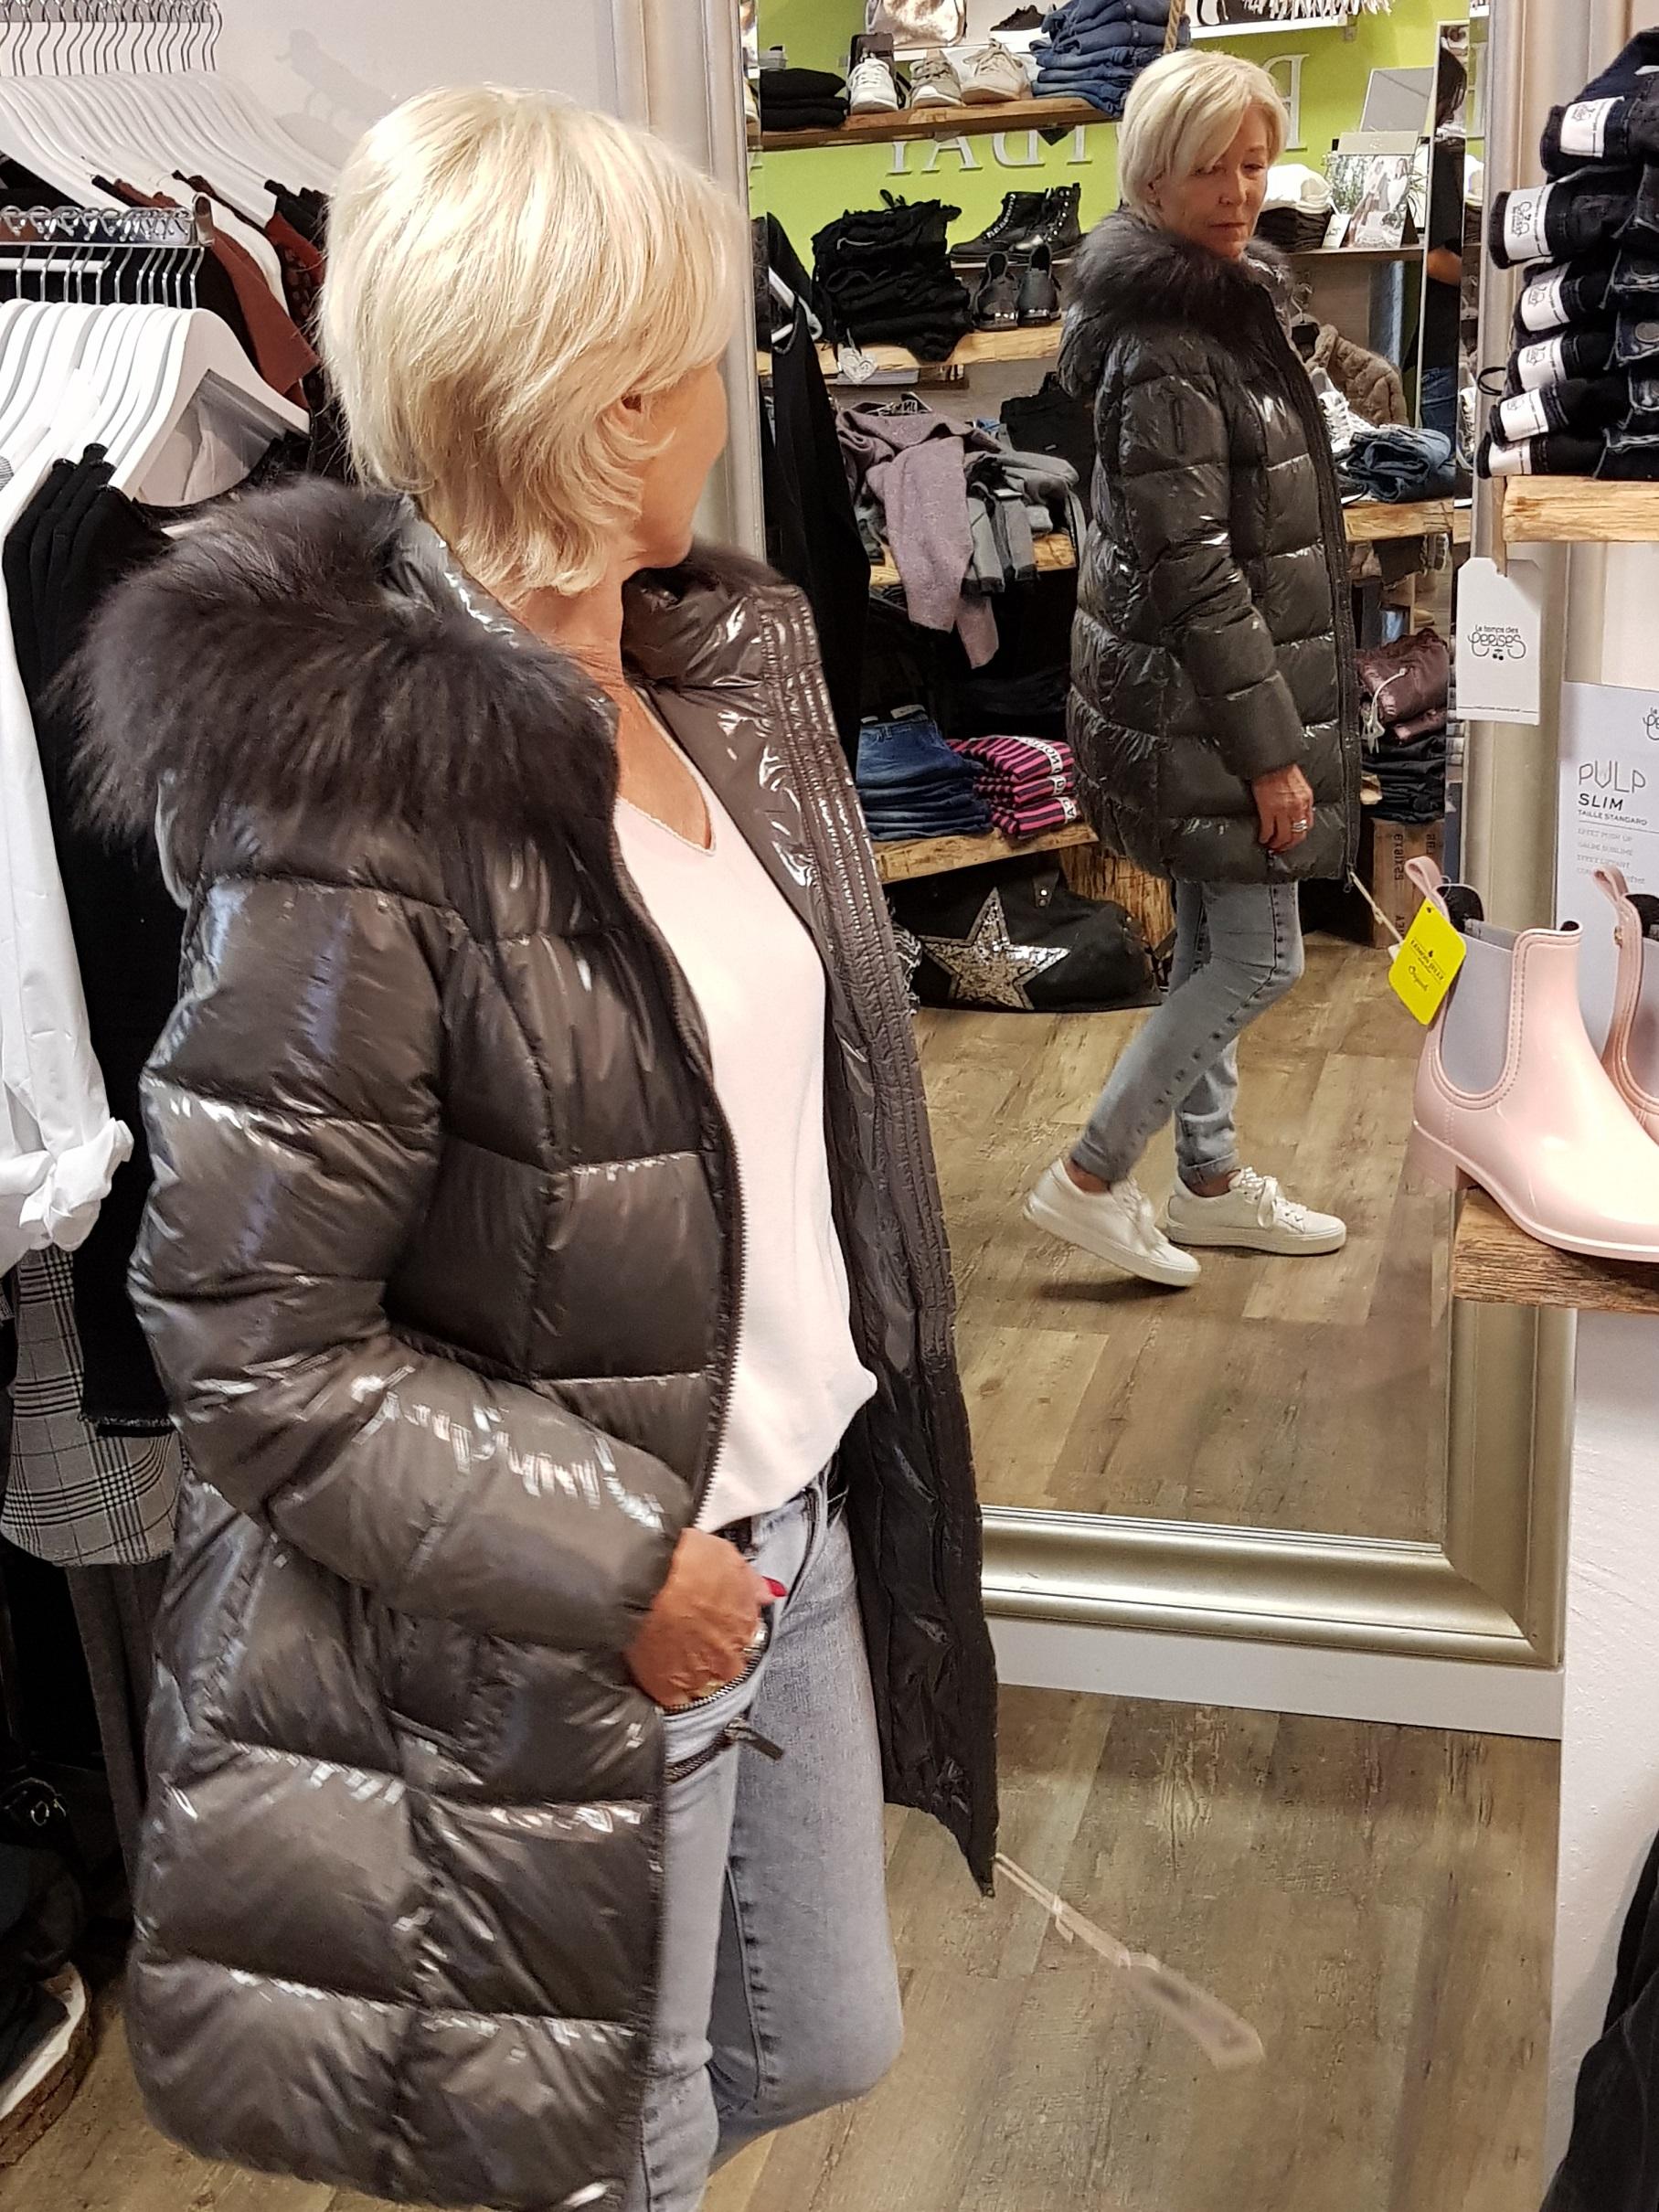 High Fashion überlegene Leistung Original kaufen Bomboogie Damen Daunen Stepp Jacke CW428P -grau metalic mit grauem Echtfell